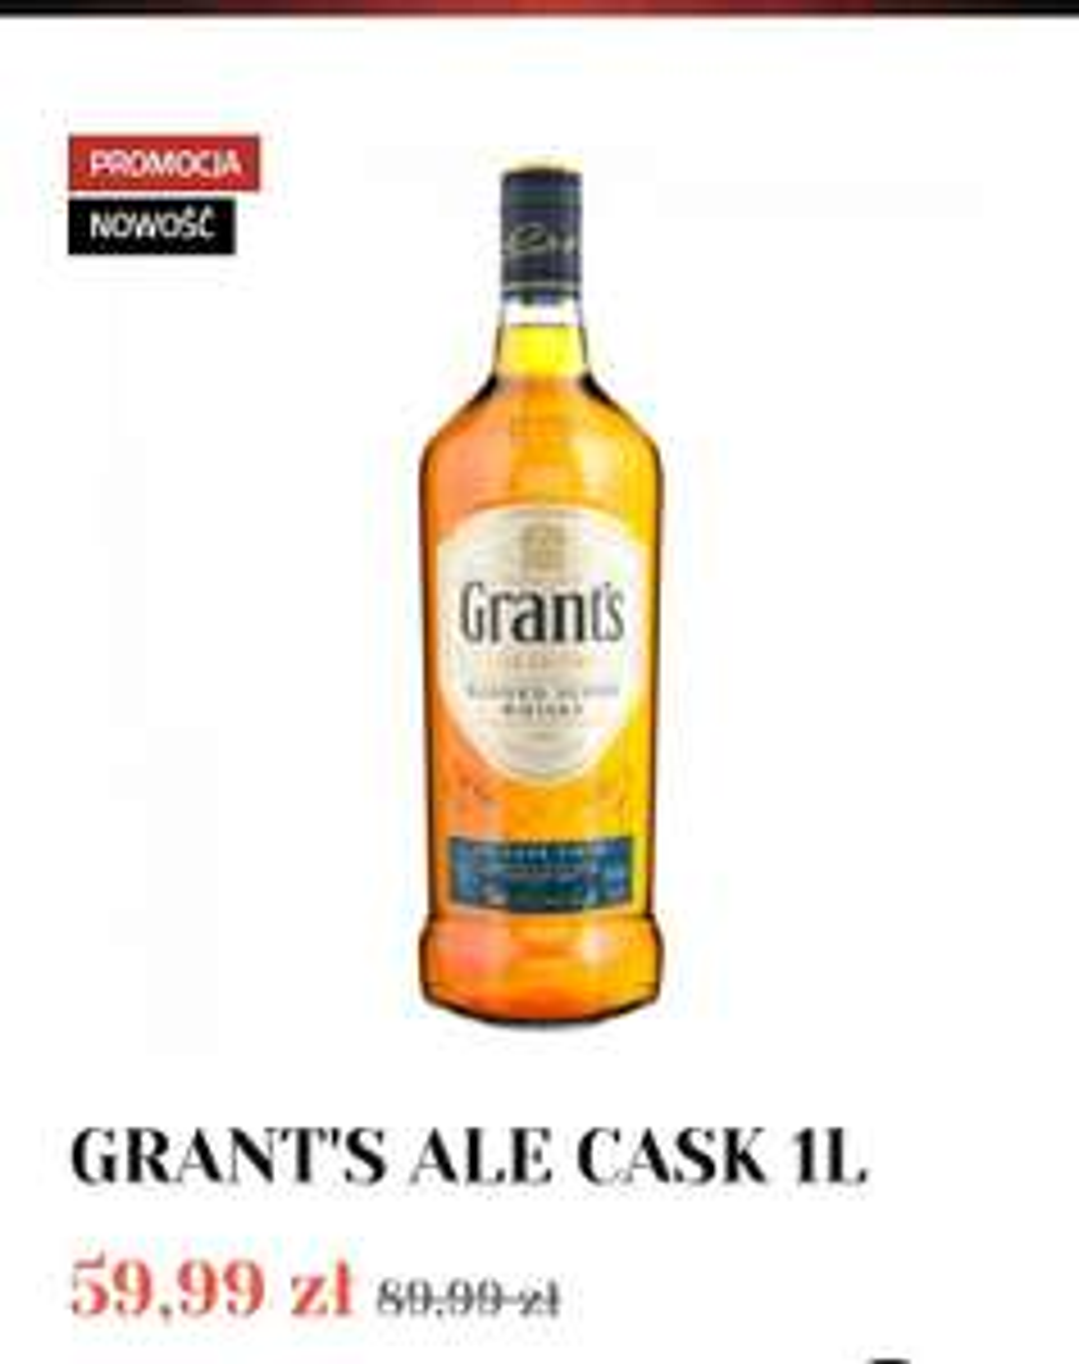 Whisky Grants Ale Cask 1L - Alkooutlet.pl